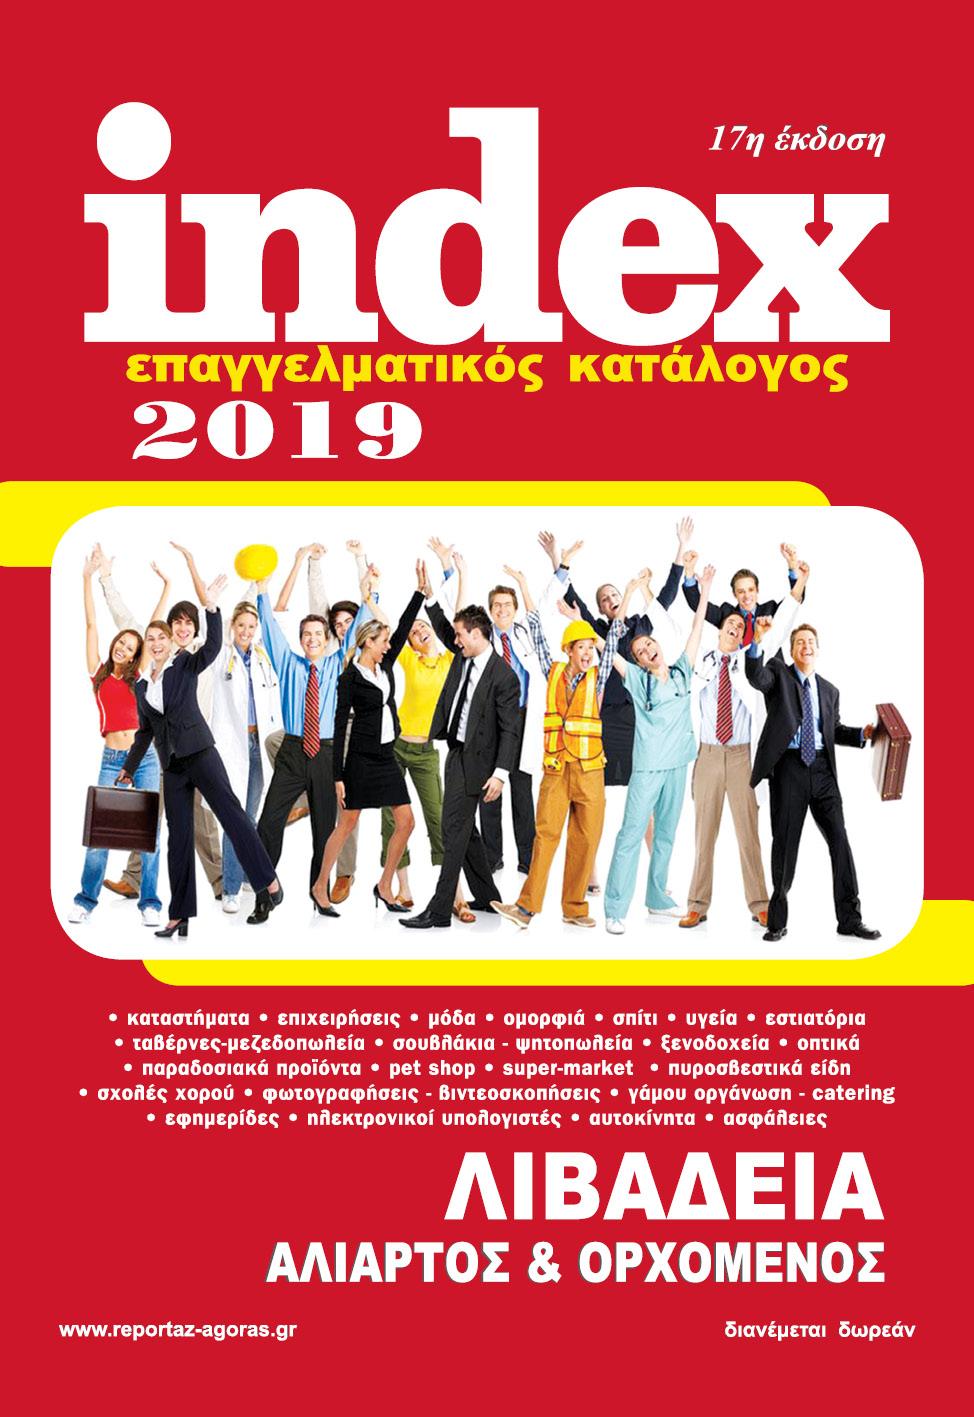 cbb5032d857 ENNEA NEWS : Επαγγελματικός Κατάλογος Index Λιβαδειά 2019